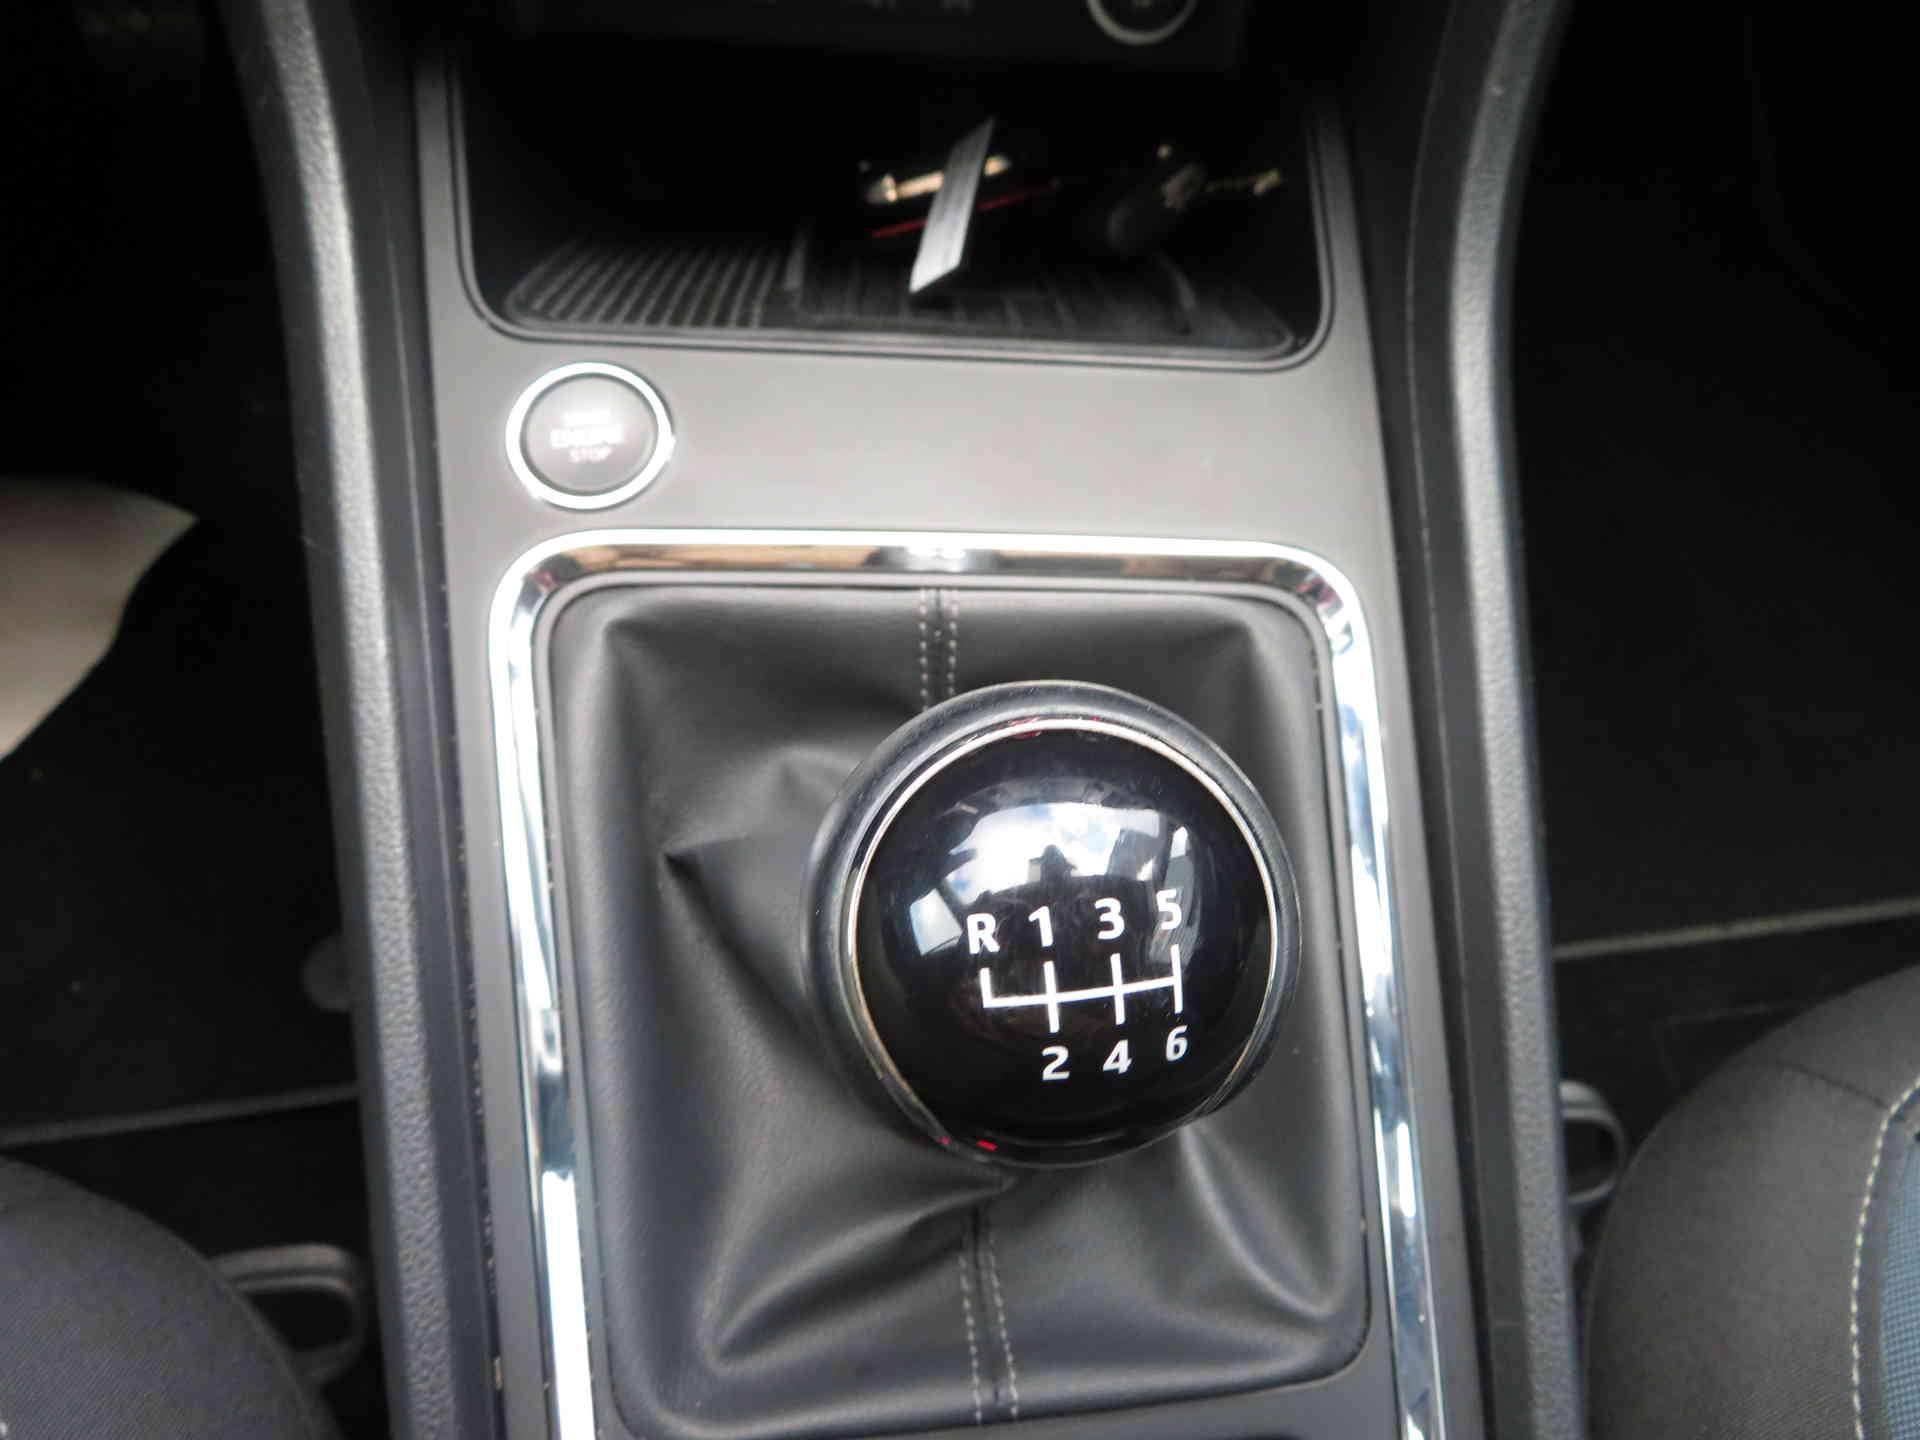 12 - Ateca 1.6 TDI 115 ch Start/Stop Ecomotive